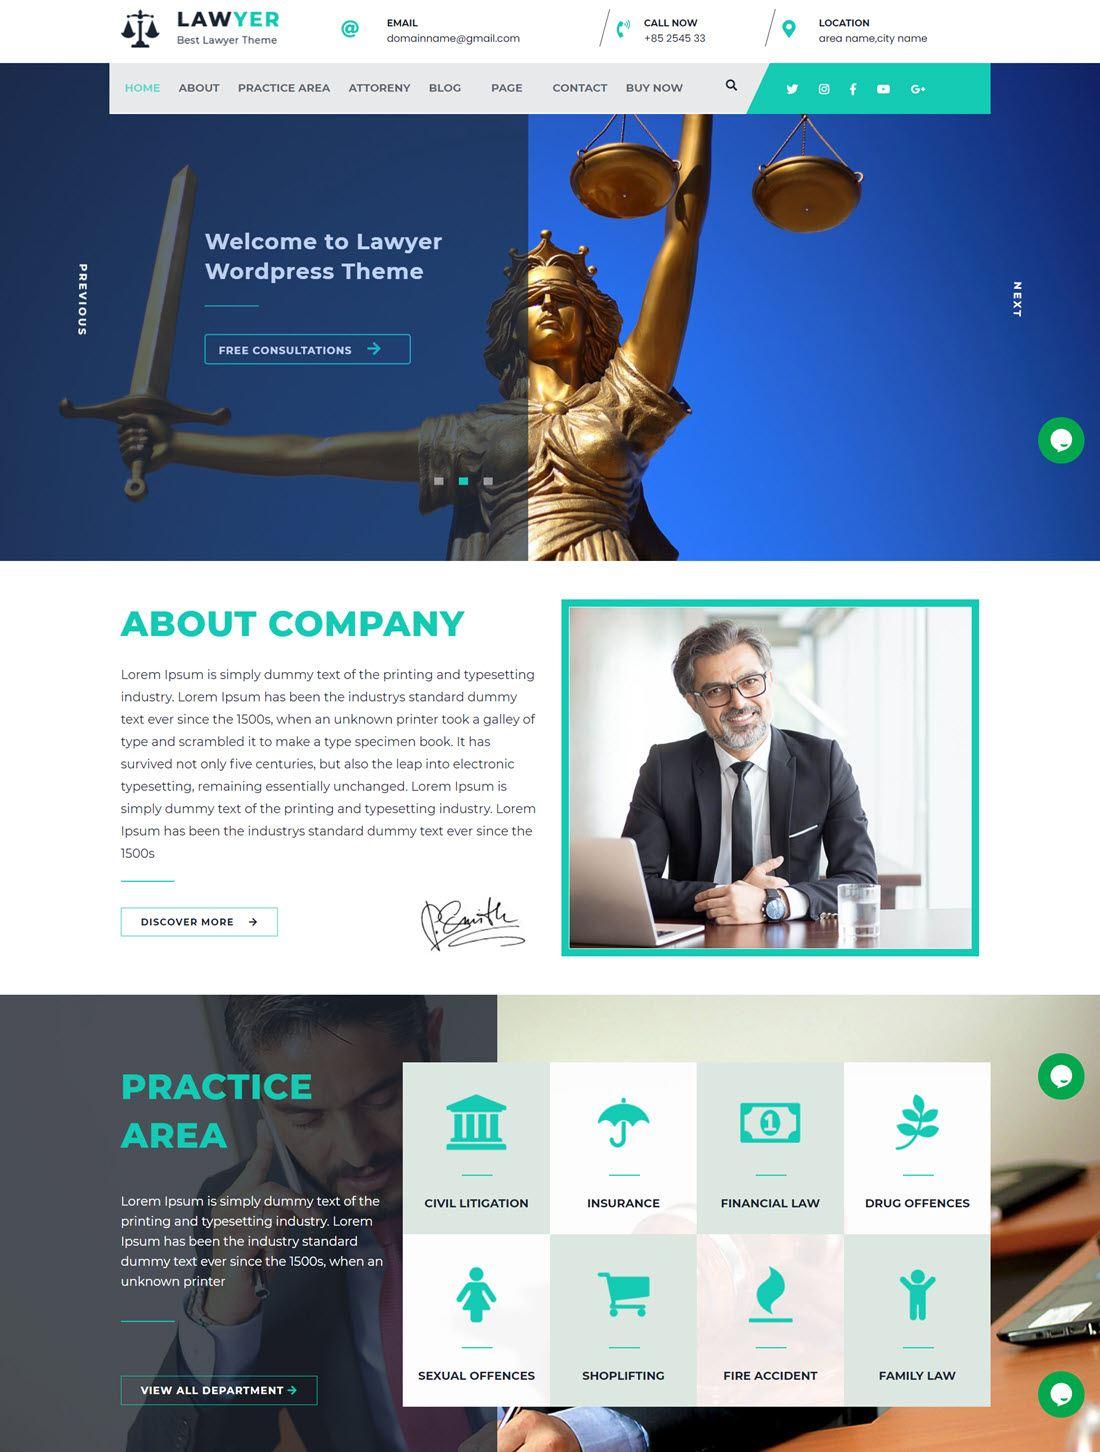 Lawyer Lite Theme For WordPress screenshot